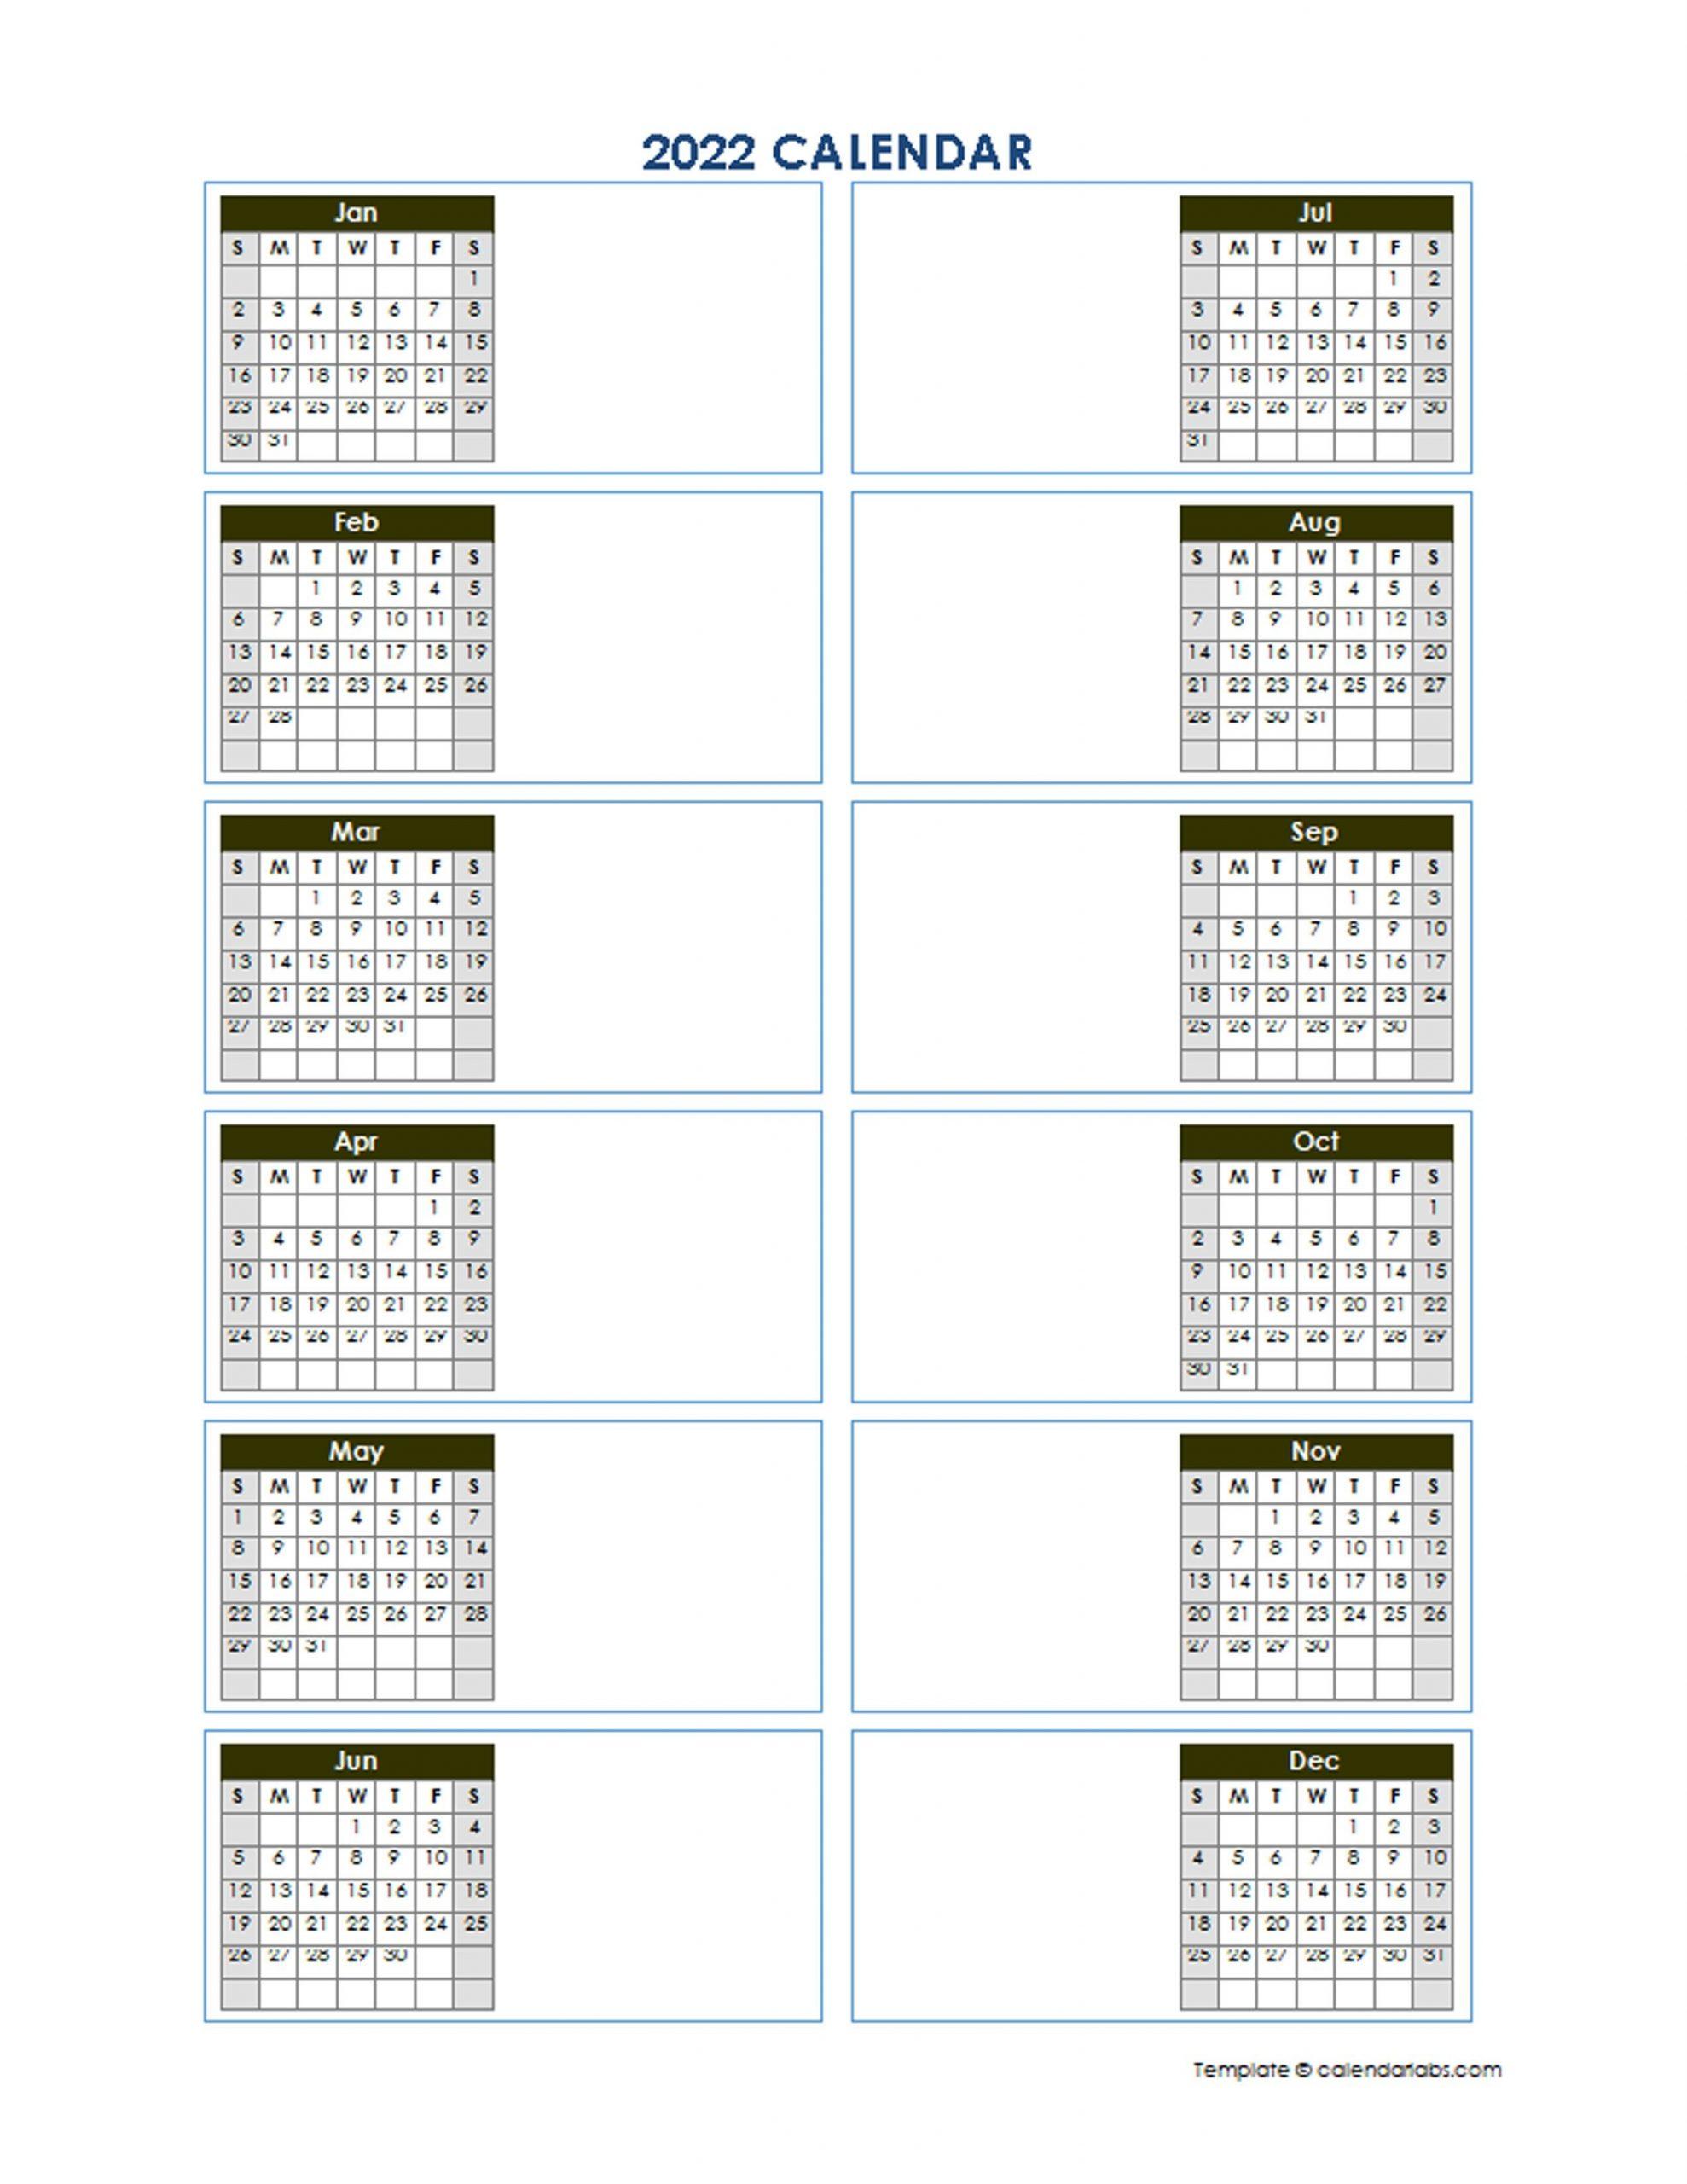 2022 Blank Yearly Calendar Template Vertical Design Free